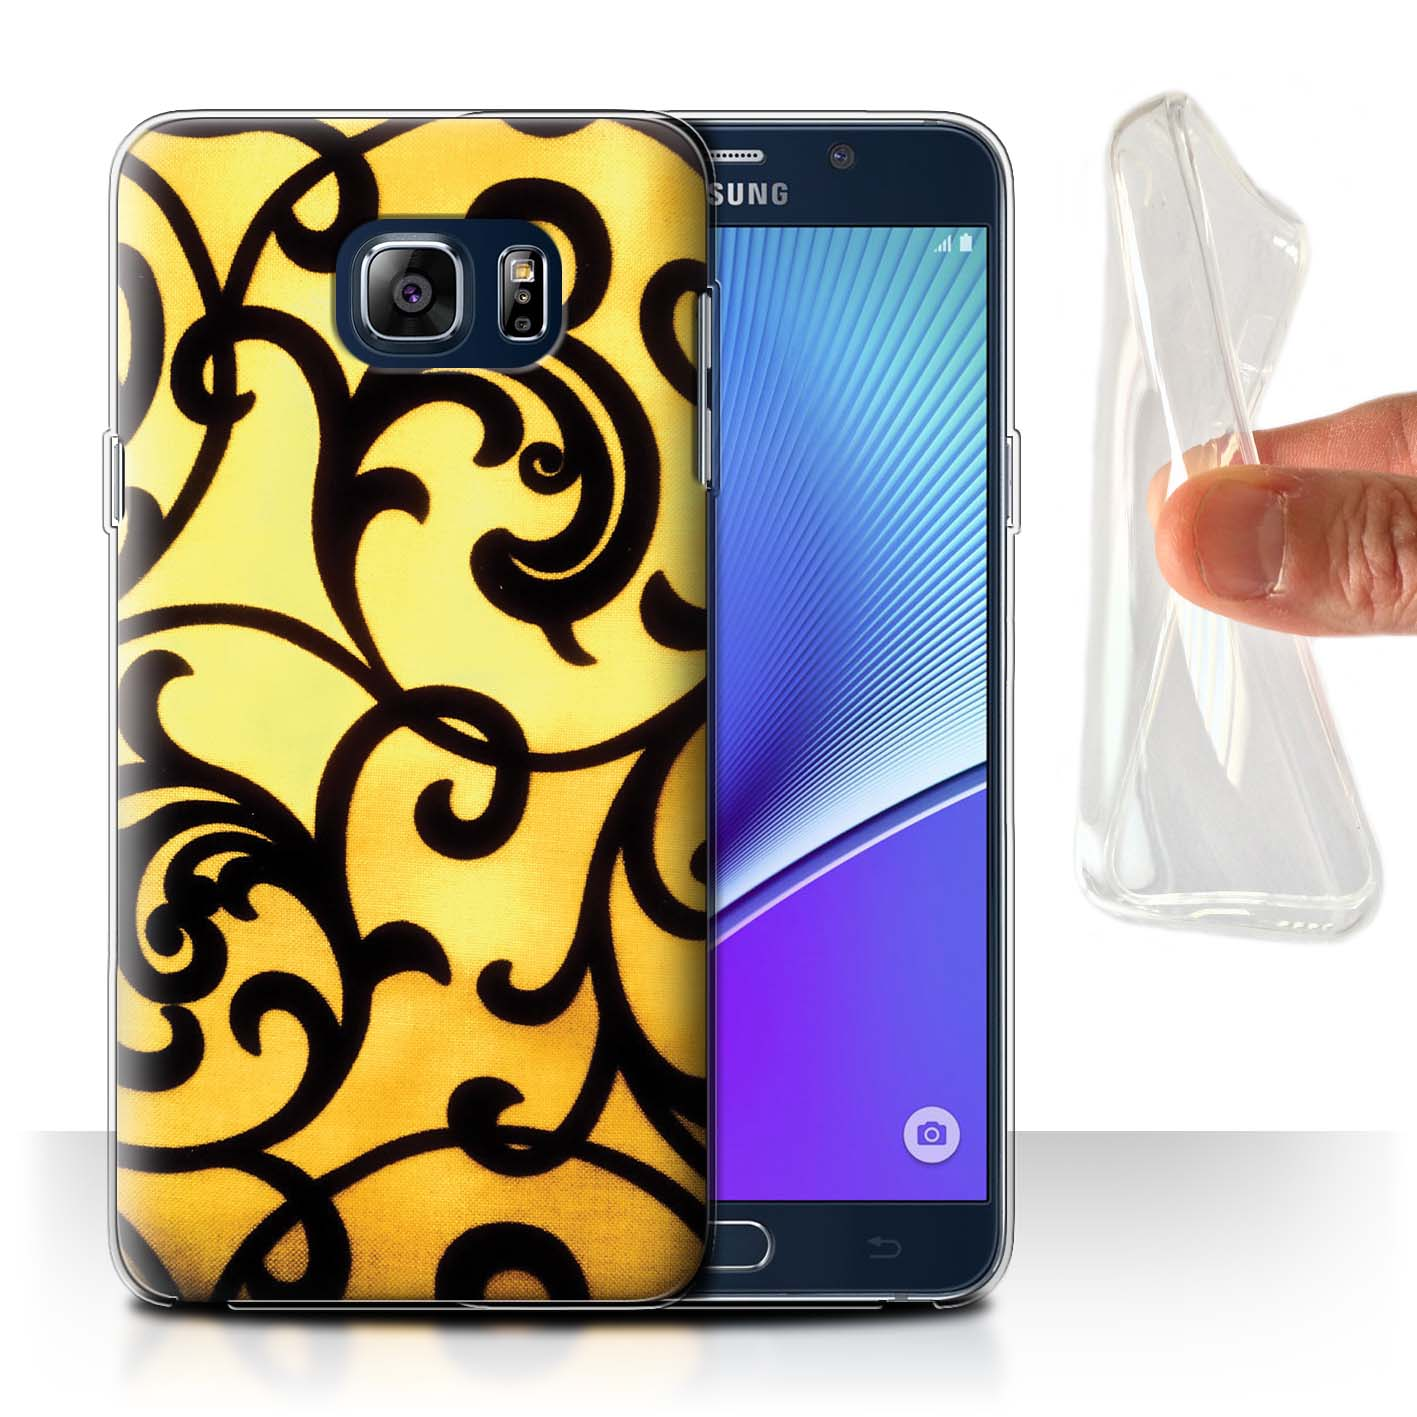 STUFF4-Gel-TPU-Phone-Case-for-Samsung-Galaxy-Note-5-N920-Yellow-Fashion